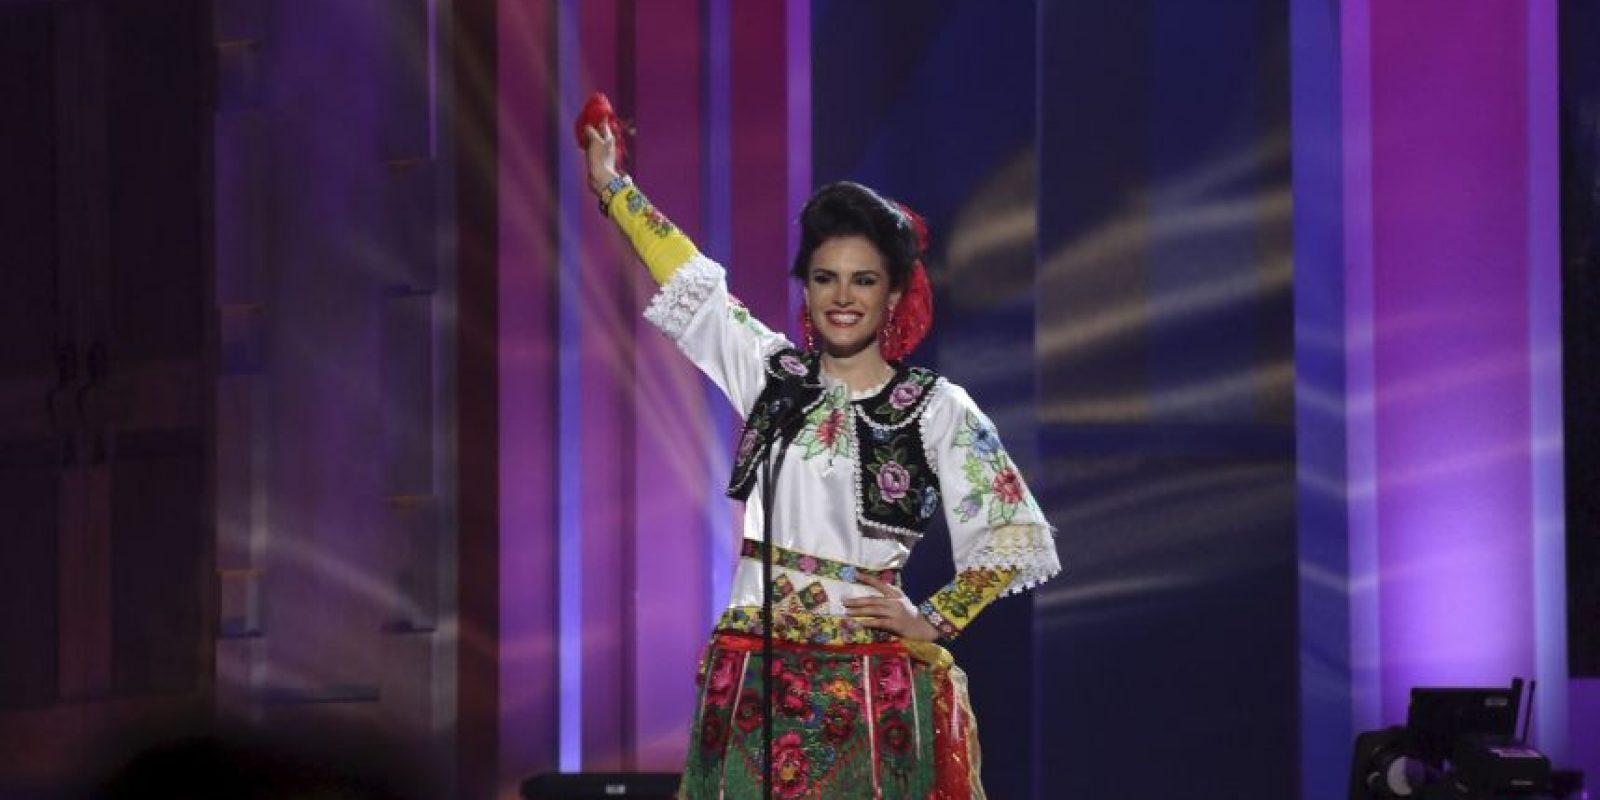 Zhaneta Byberi, Miss Albania Foto:AP